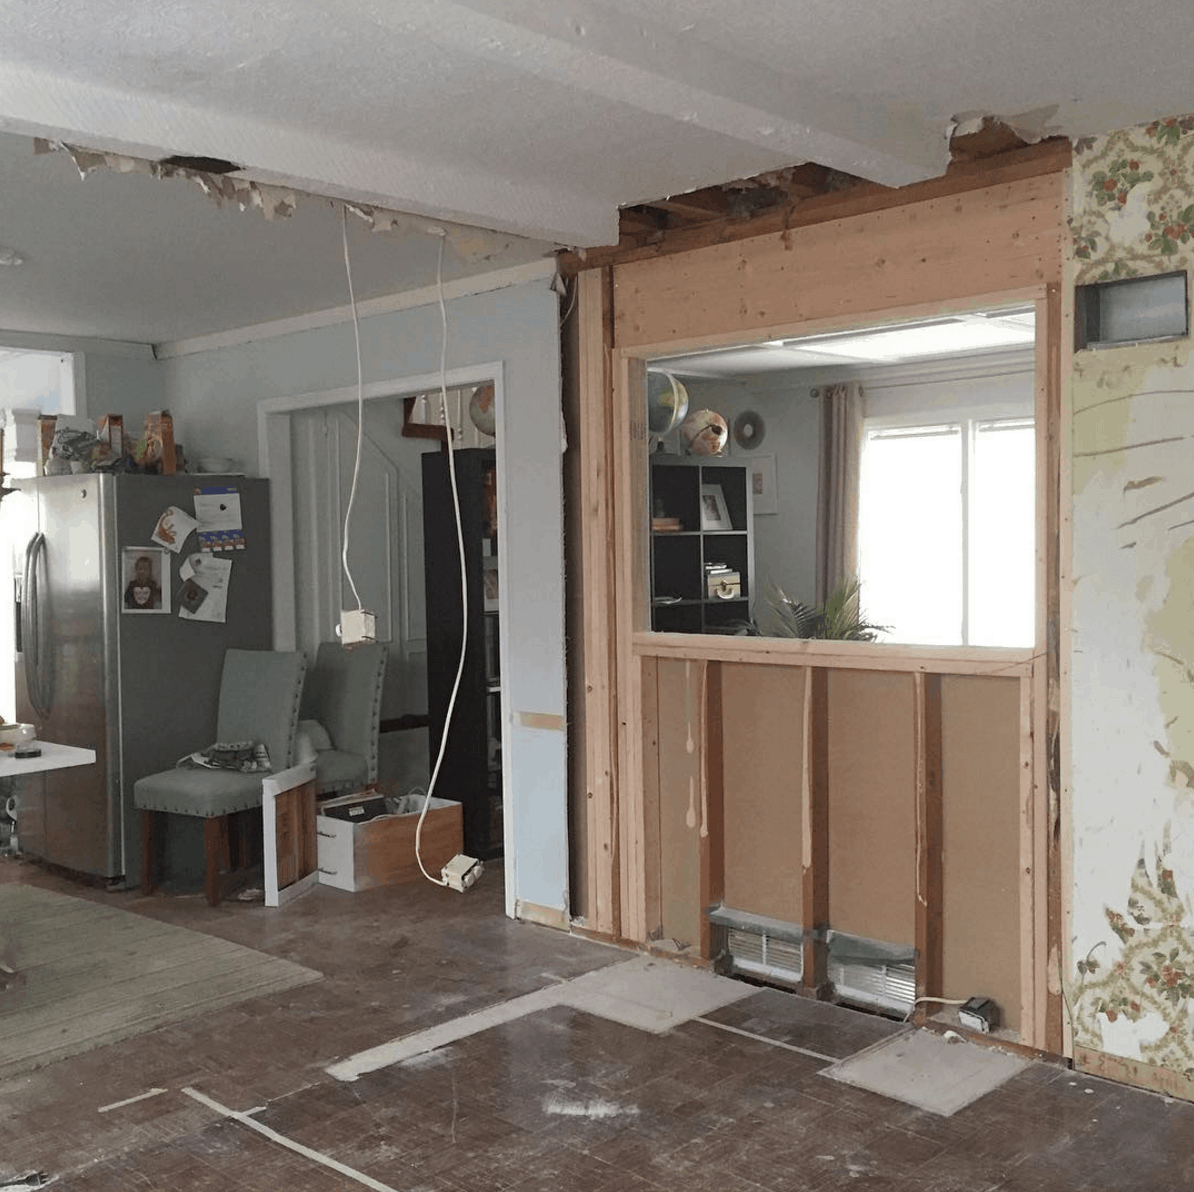 diy ikea kitchen layout before photos passthrough loadbearing